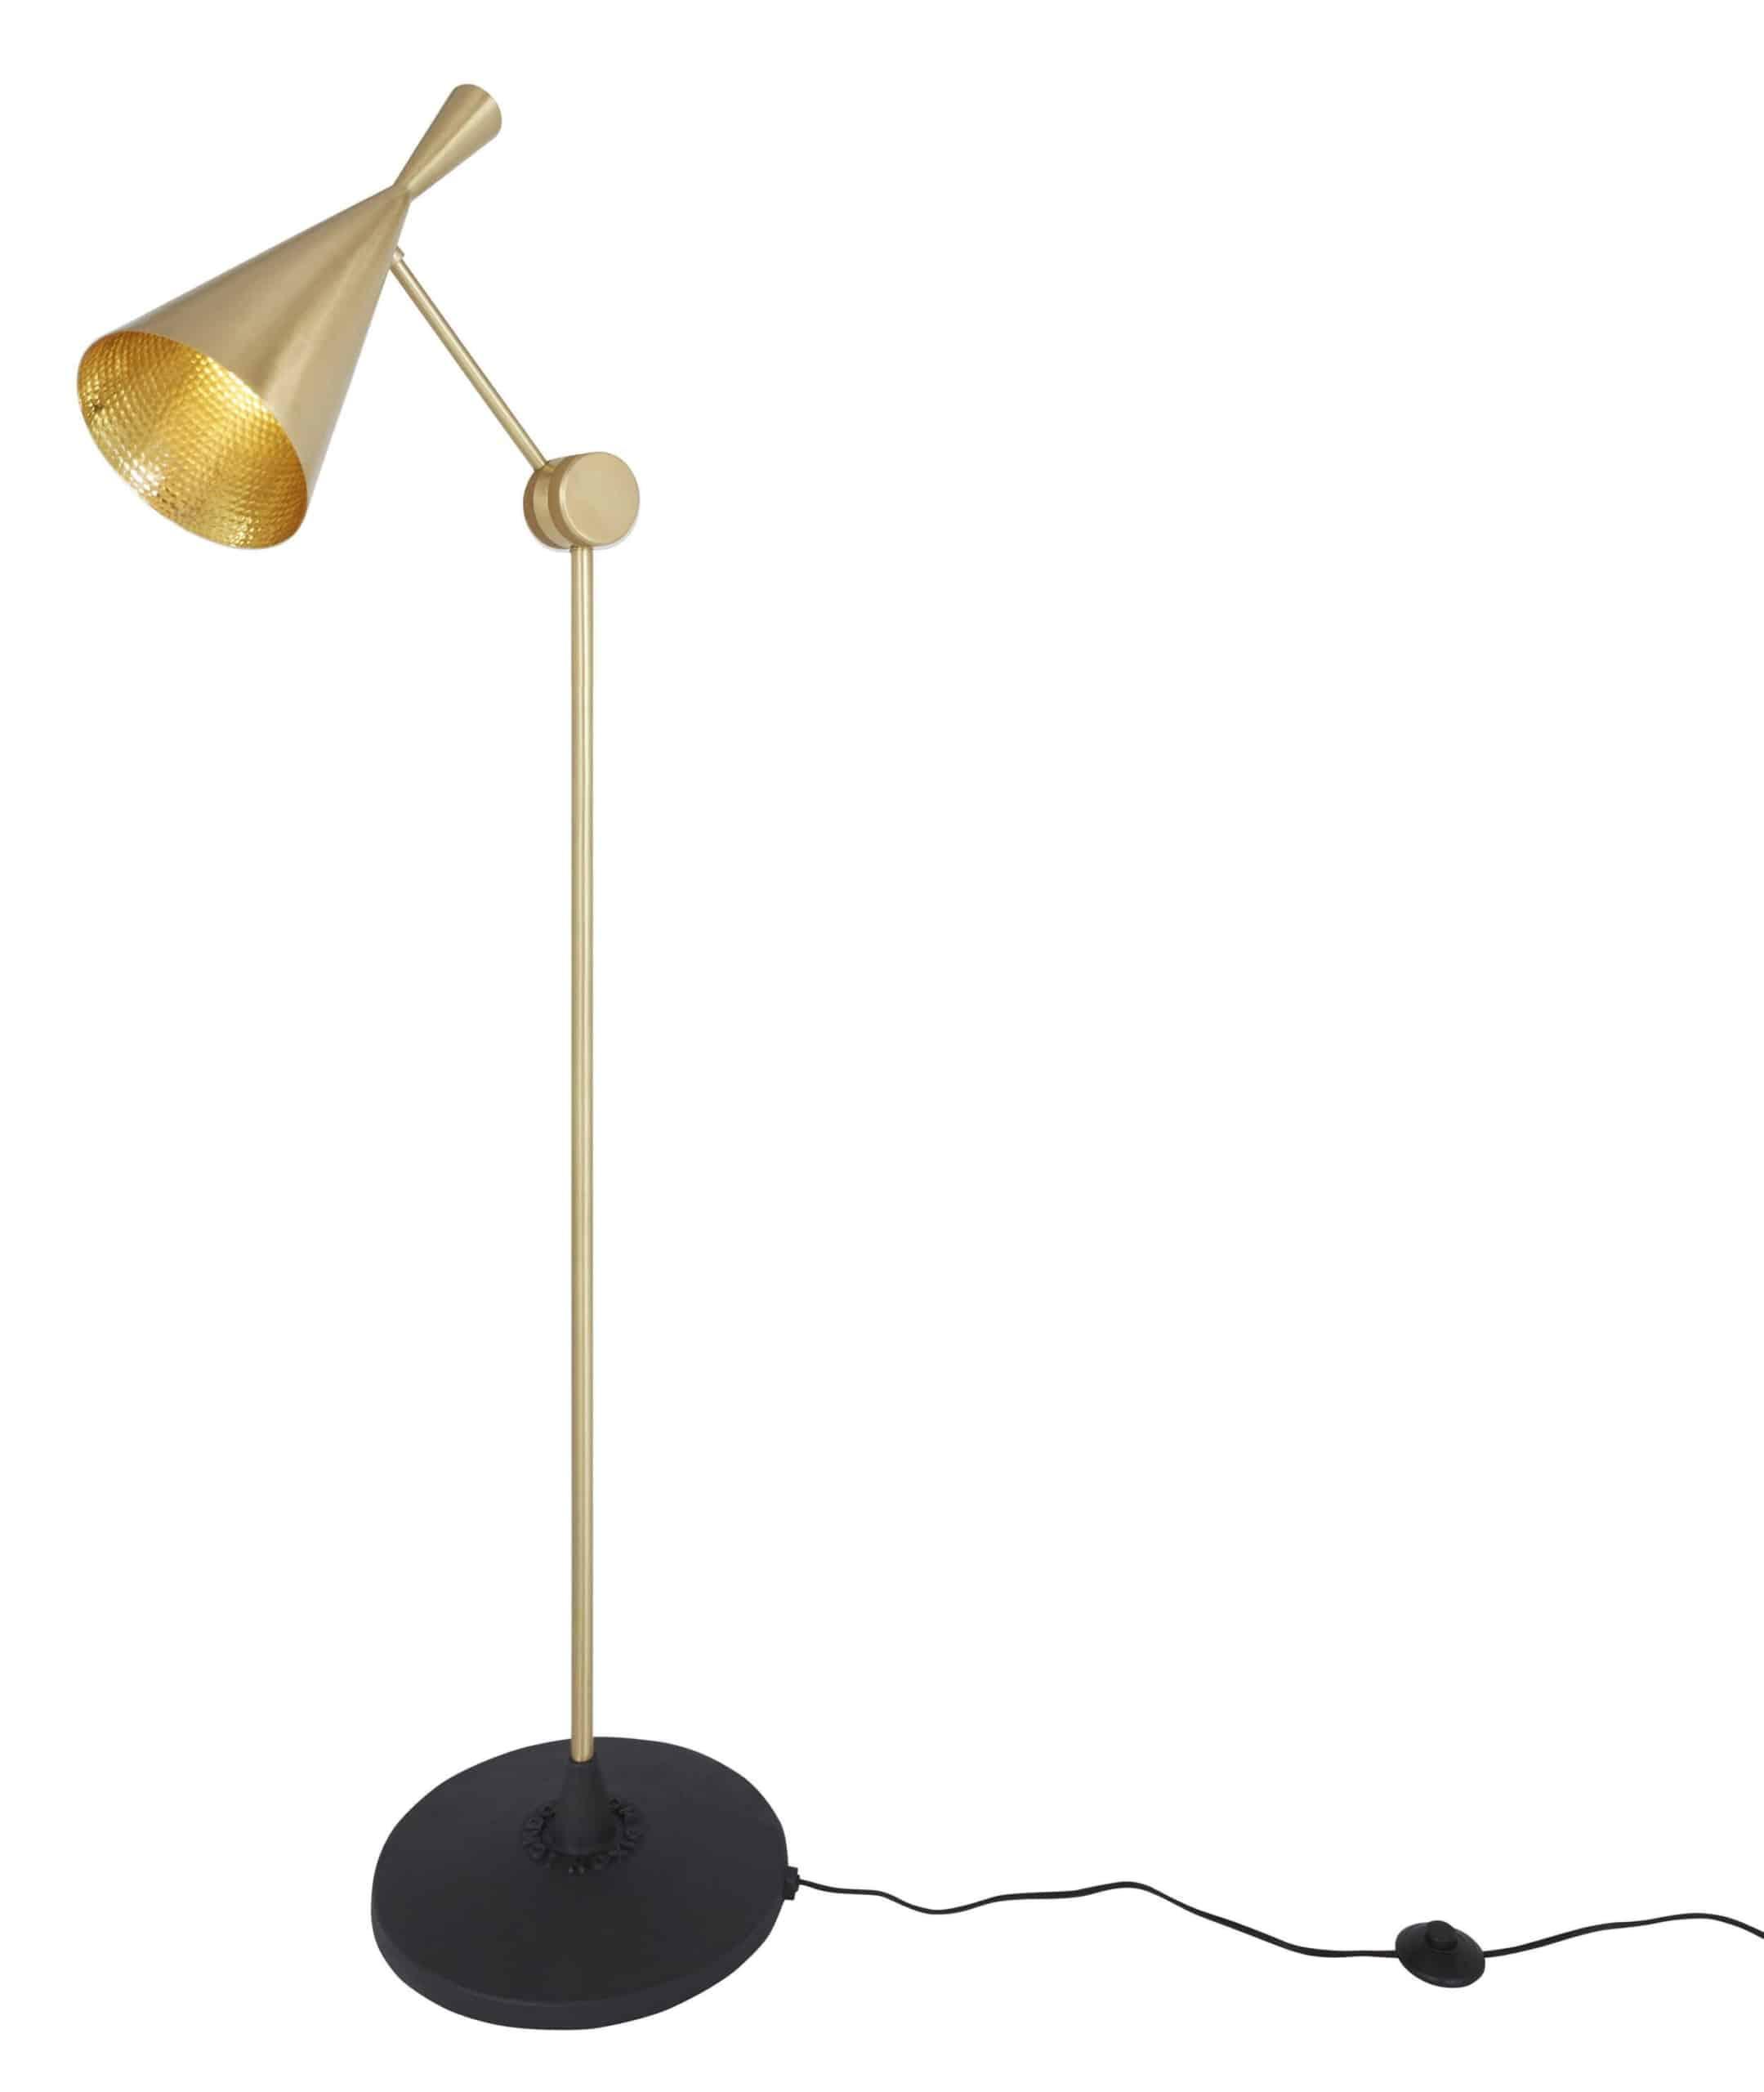 Standerlampen fra serien Beat Light fra Tom Dixon fås i sort eller børstet messing. Lampen har et harmonisk og slankt udtryk.